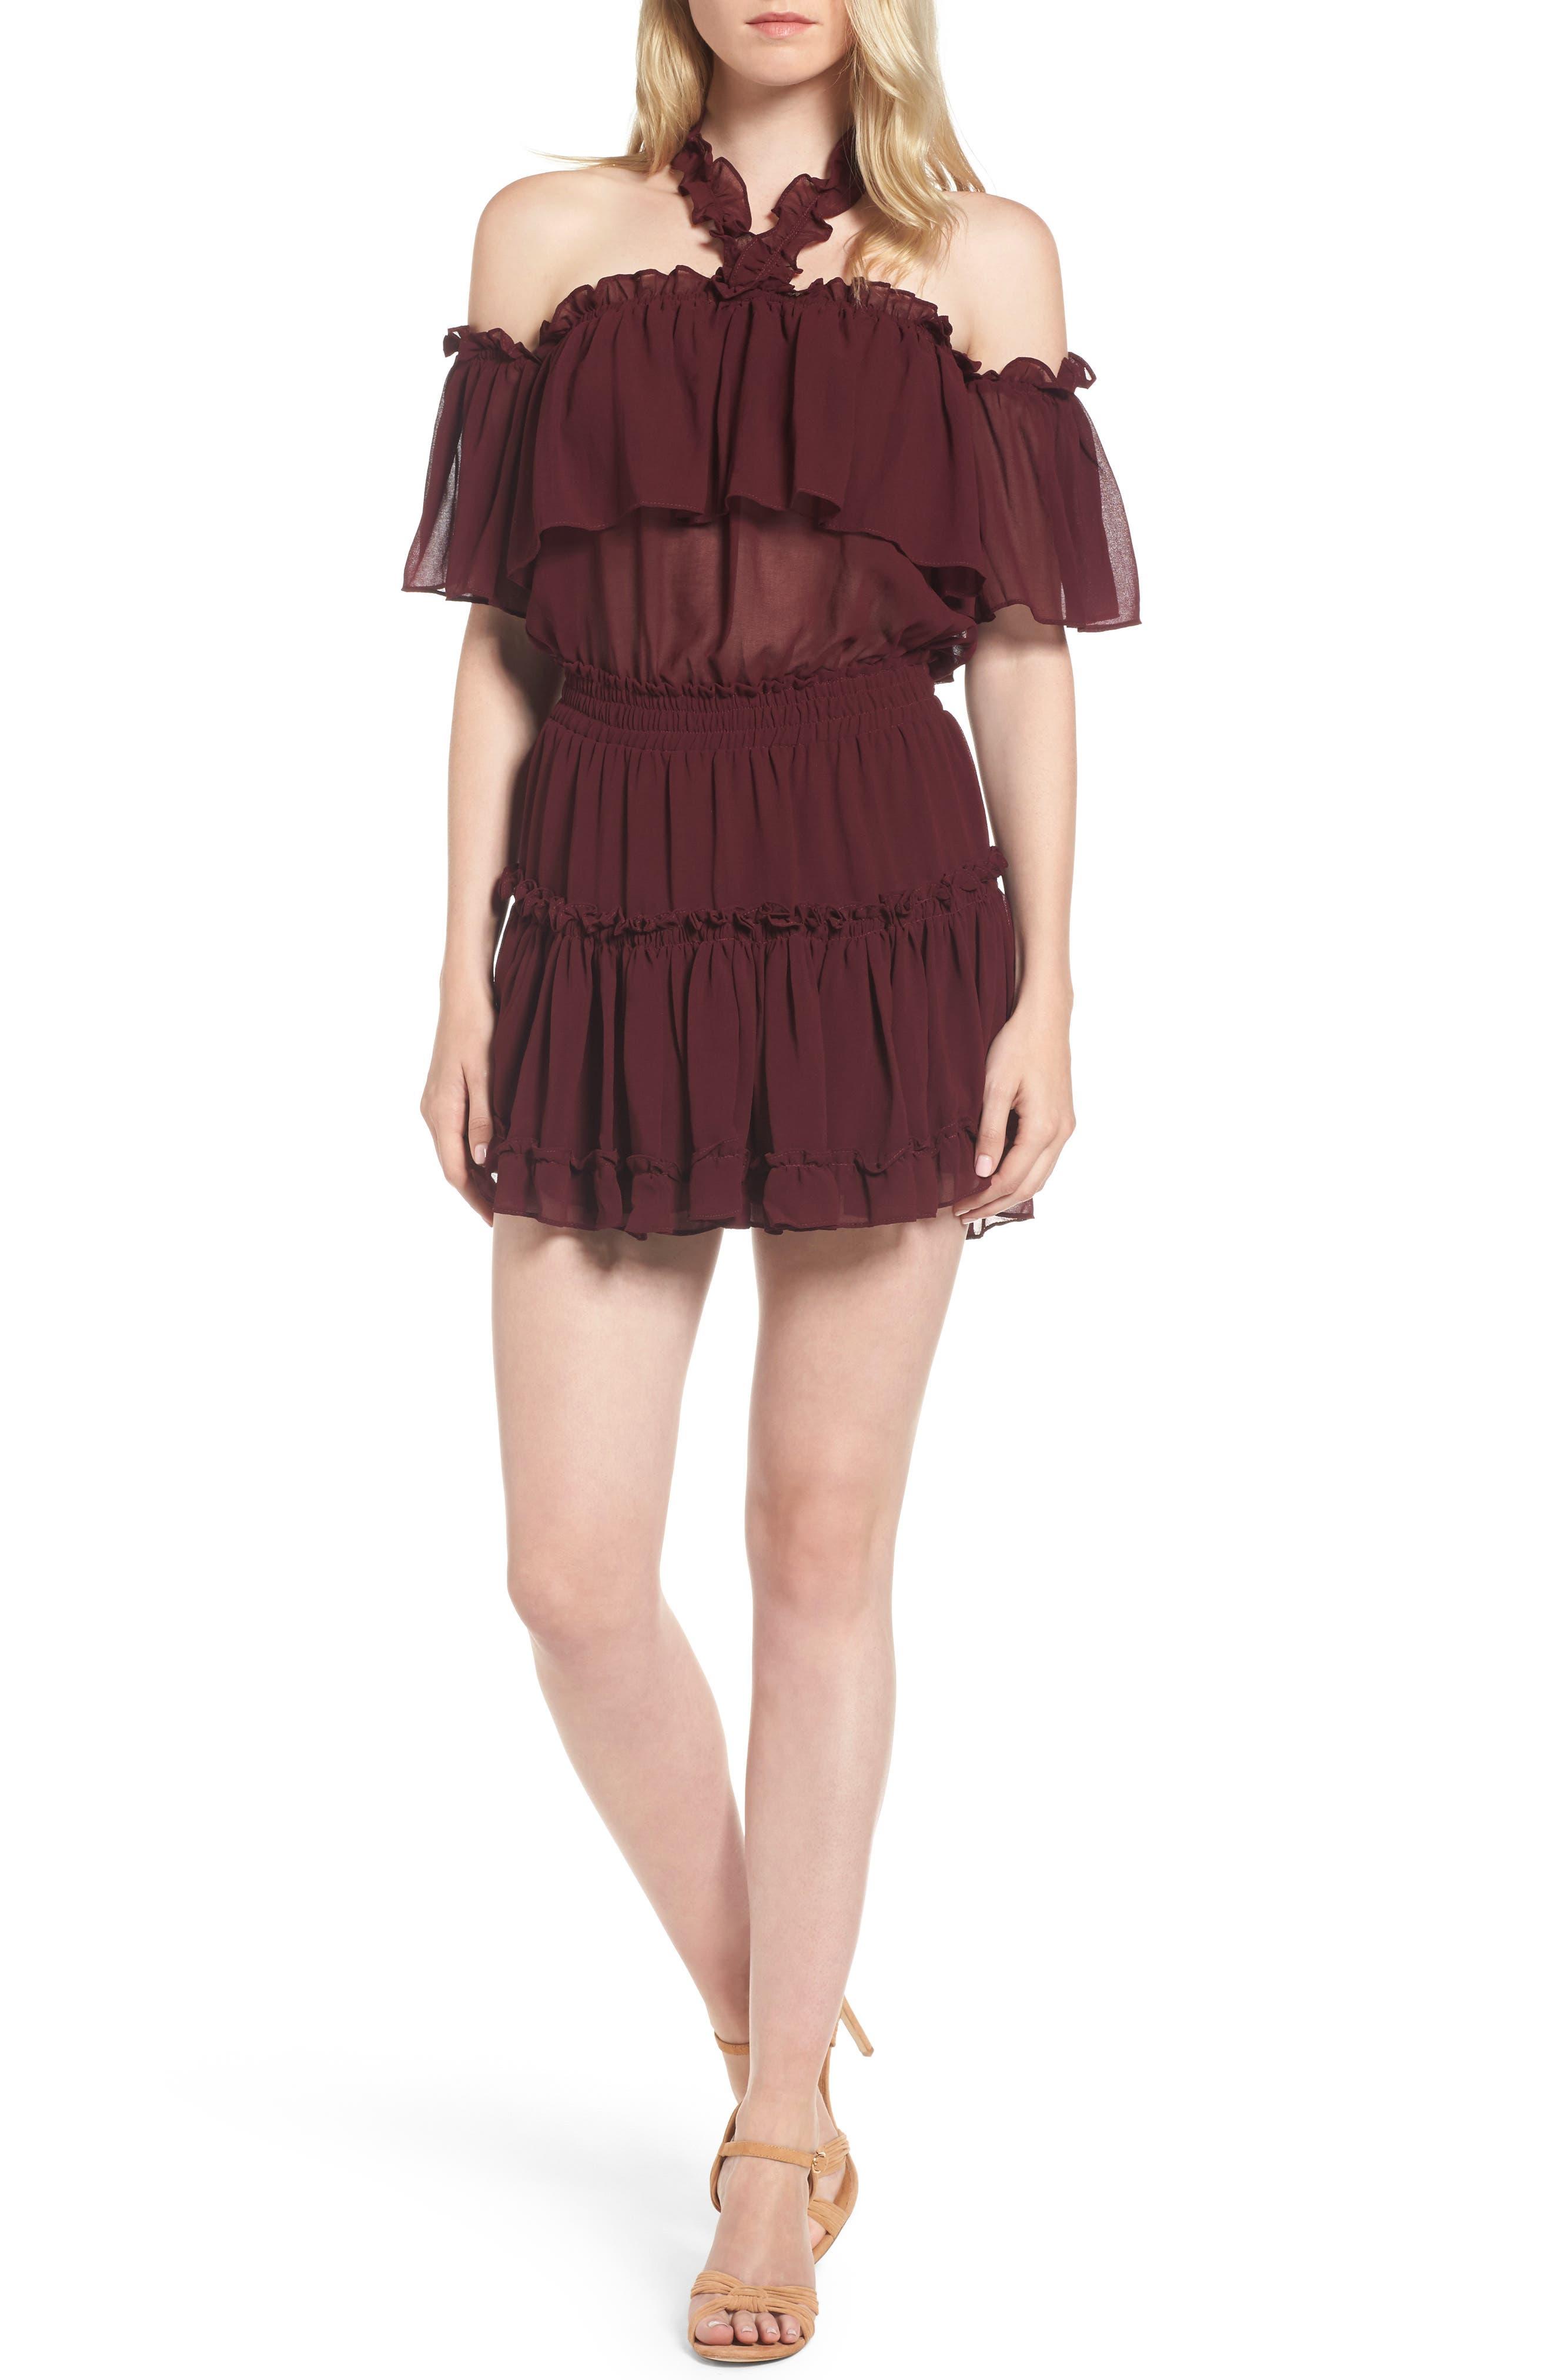 Melis Minidress,                         Main,                         color, Burgundy